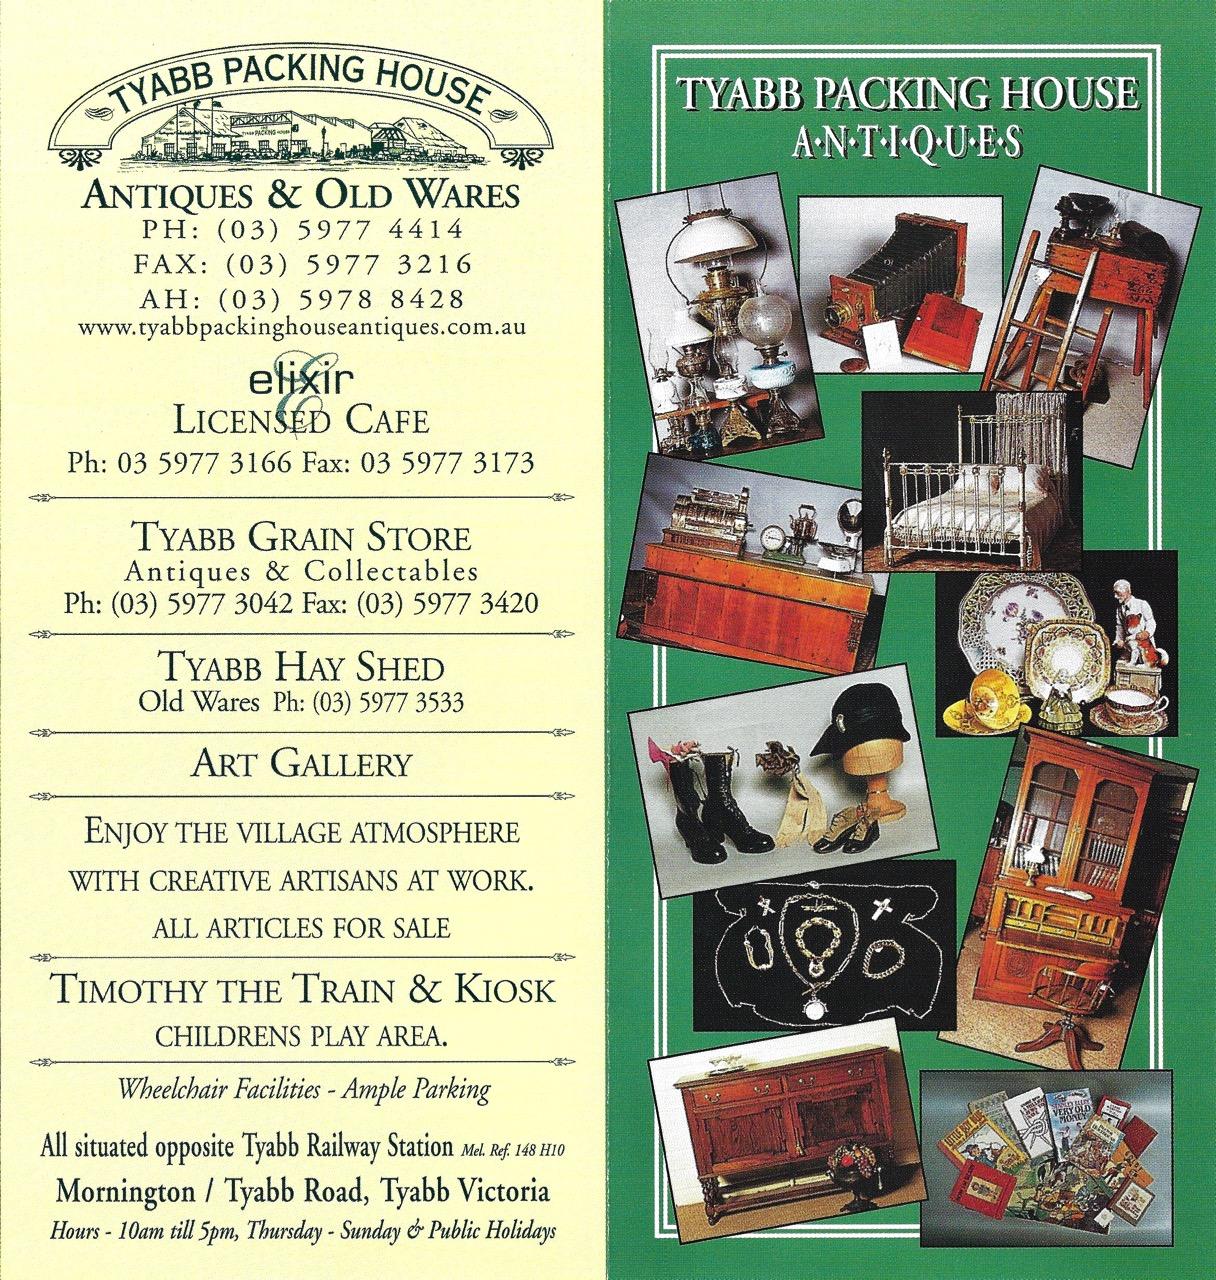 Promo card circa late-1990s